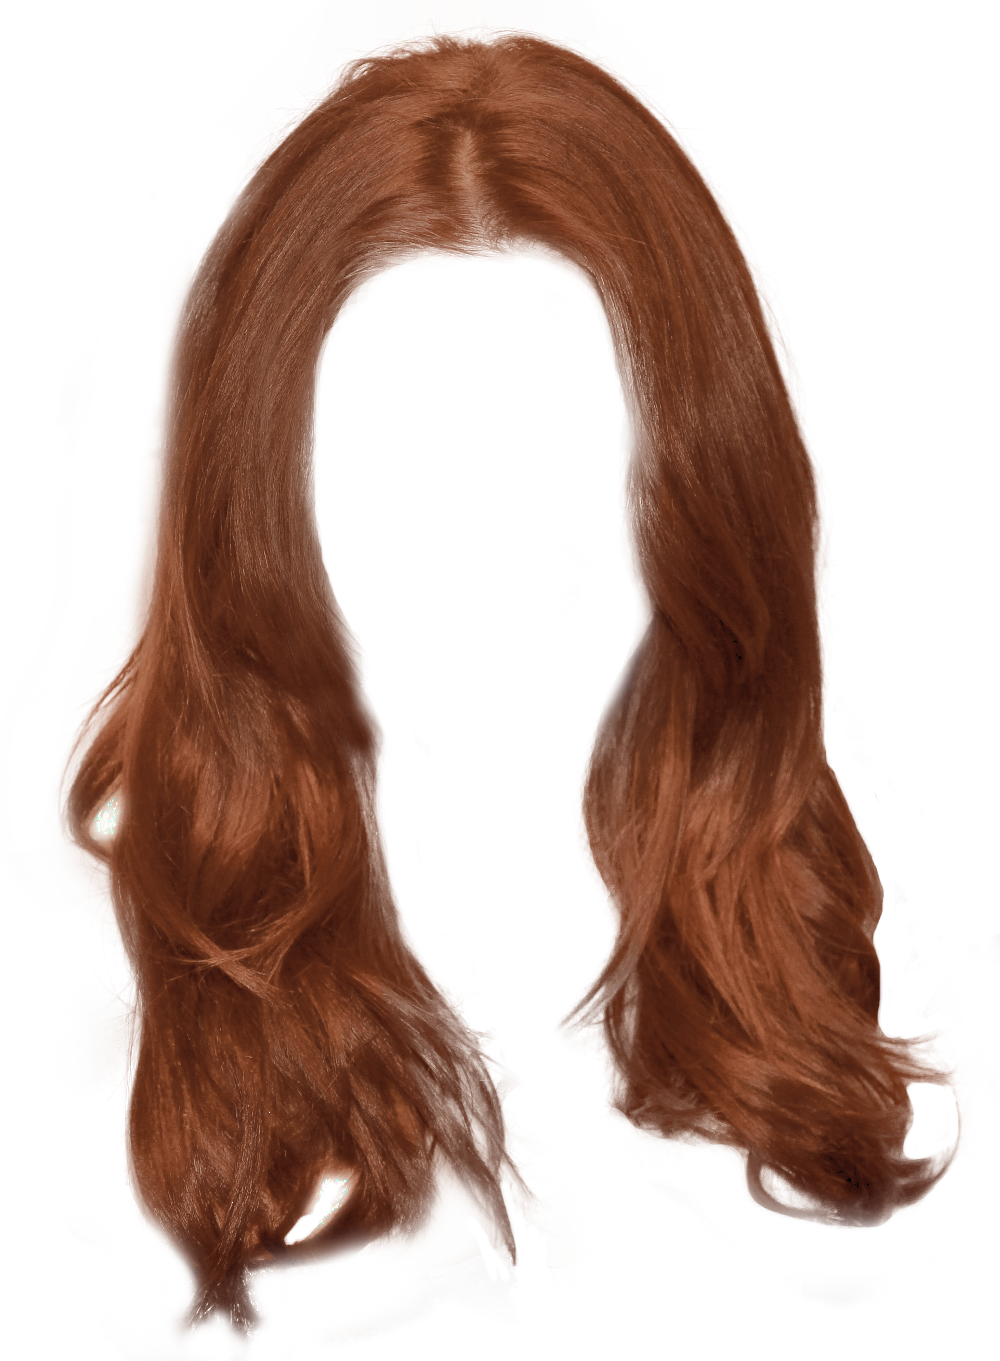 Long Women Hair Png image #26043 - Hairstyles PNG